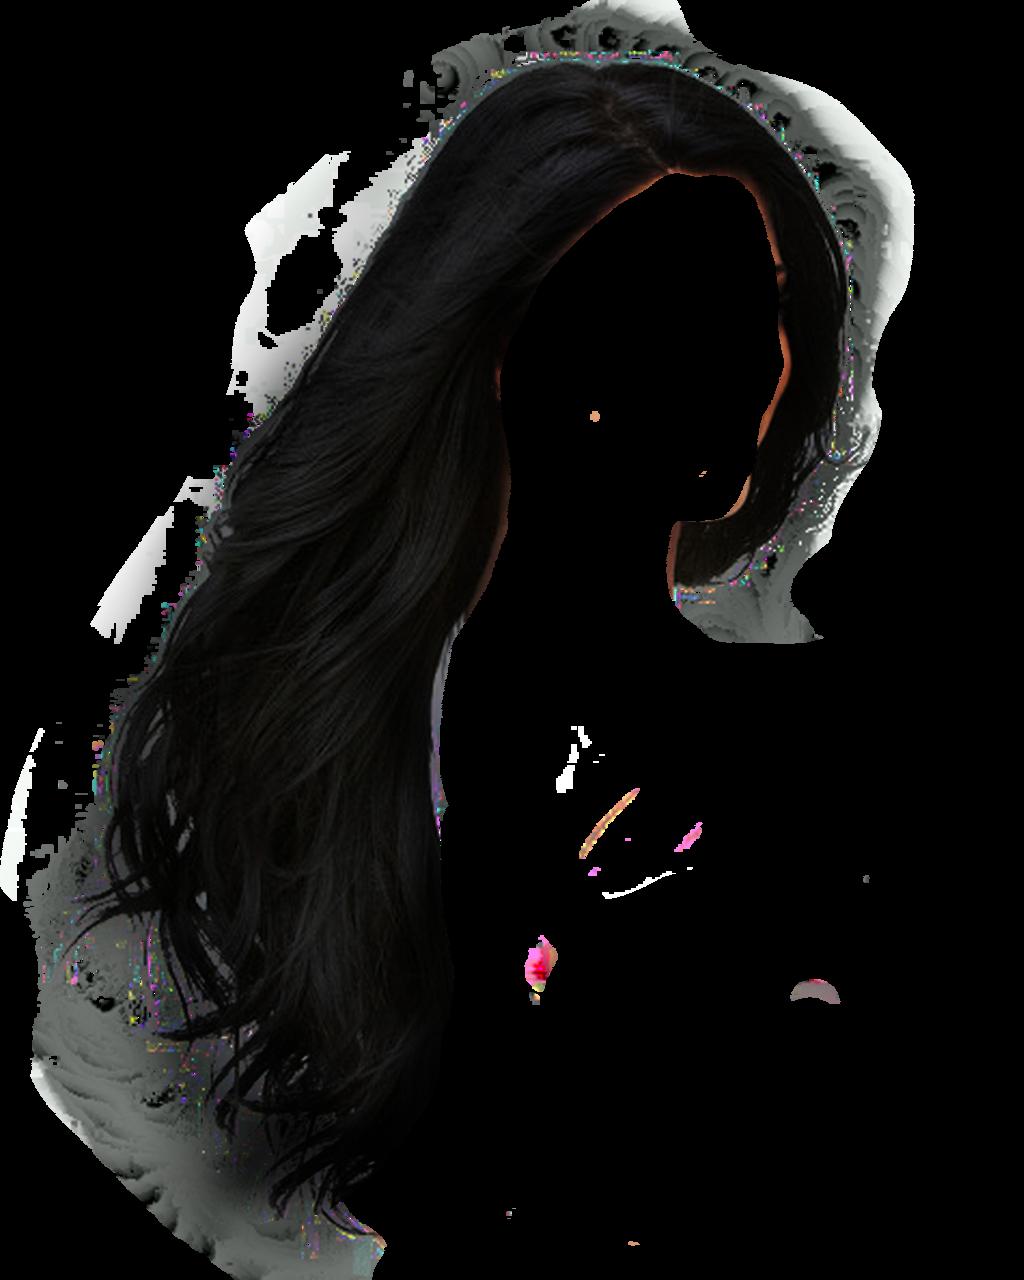 Hair Png 10